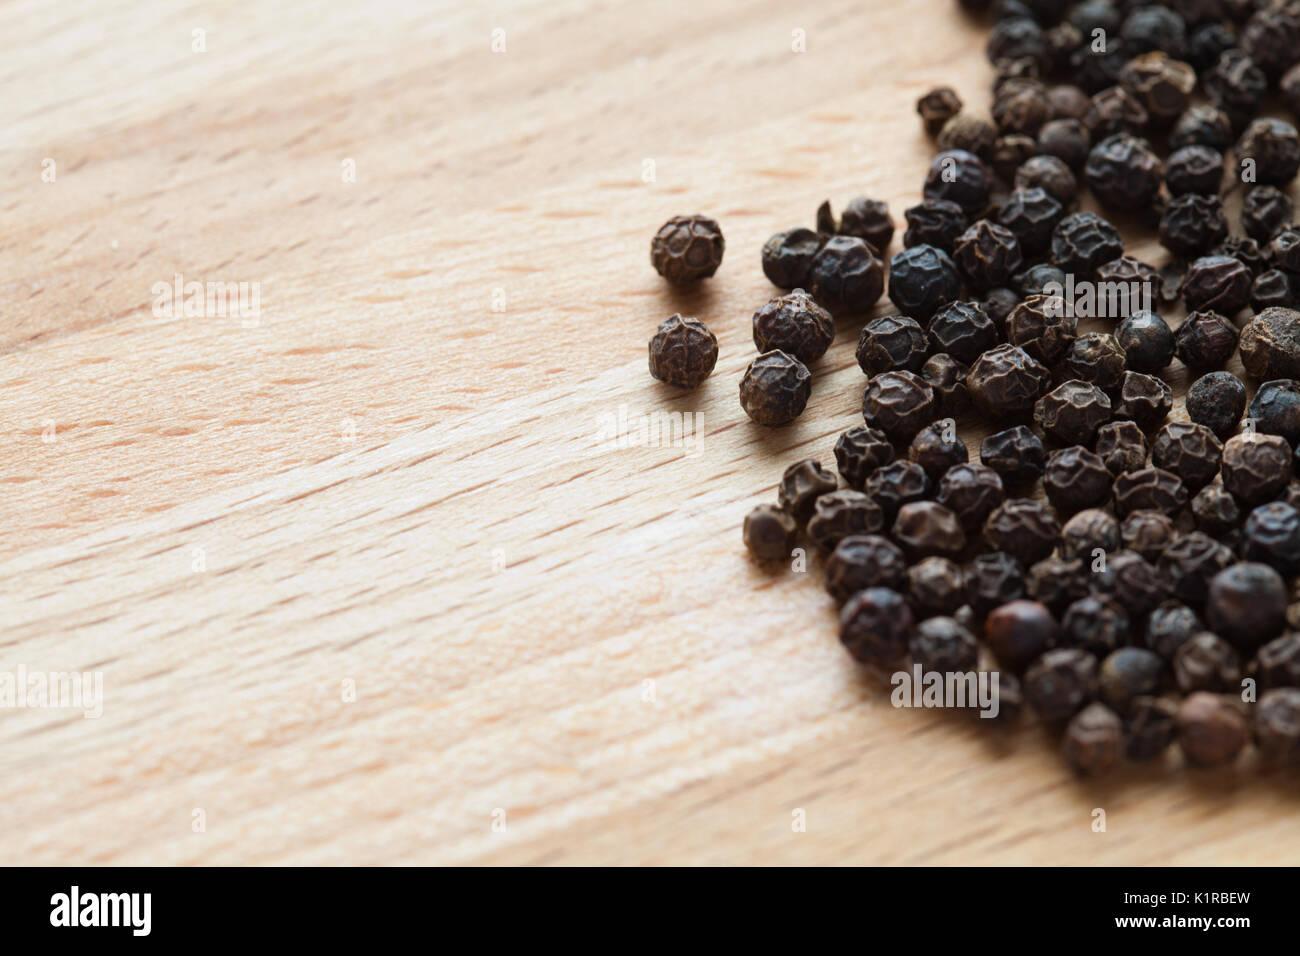 Black peppercorns - Stock Image